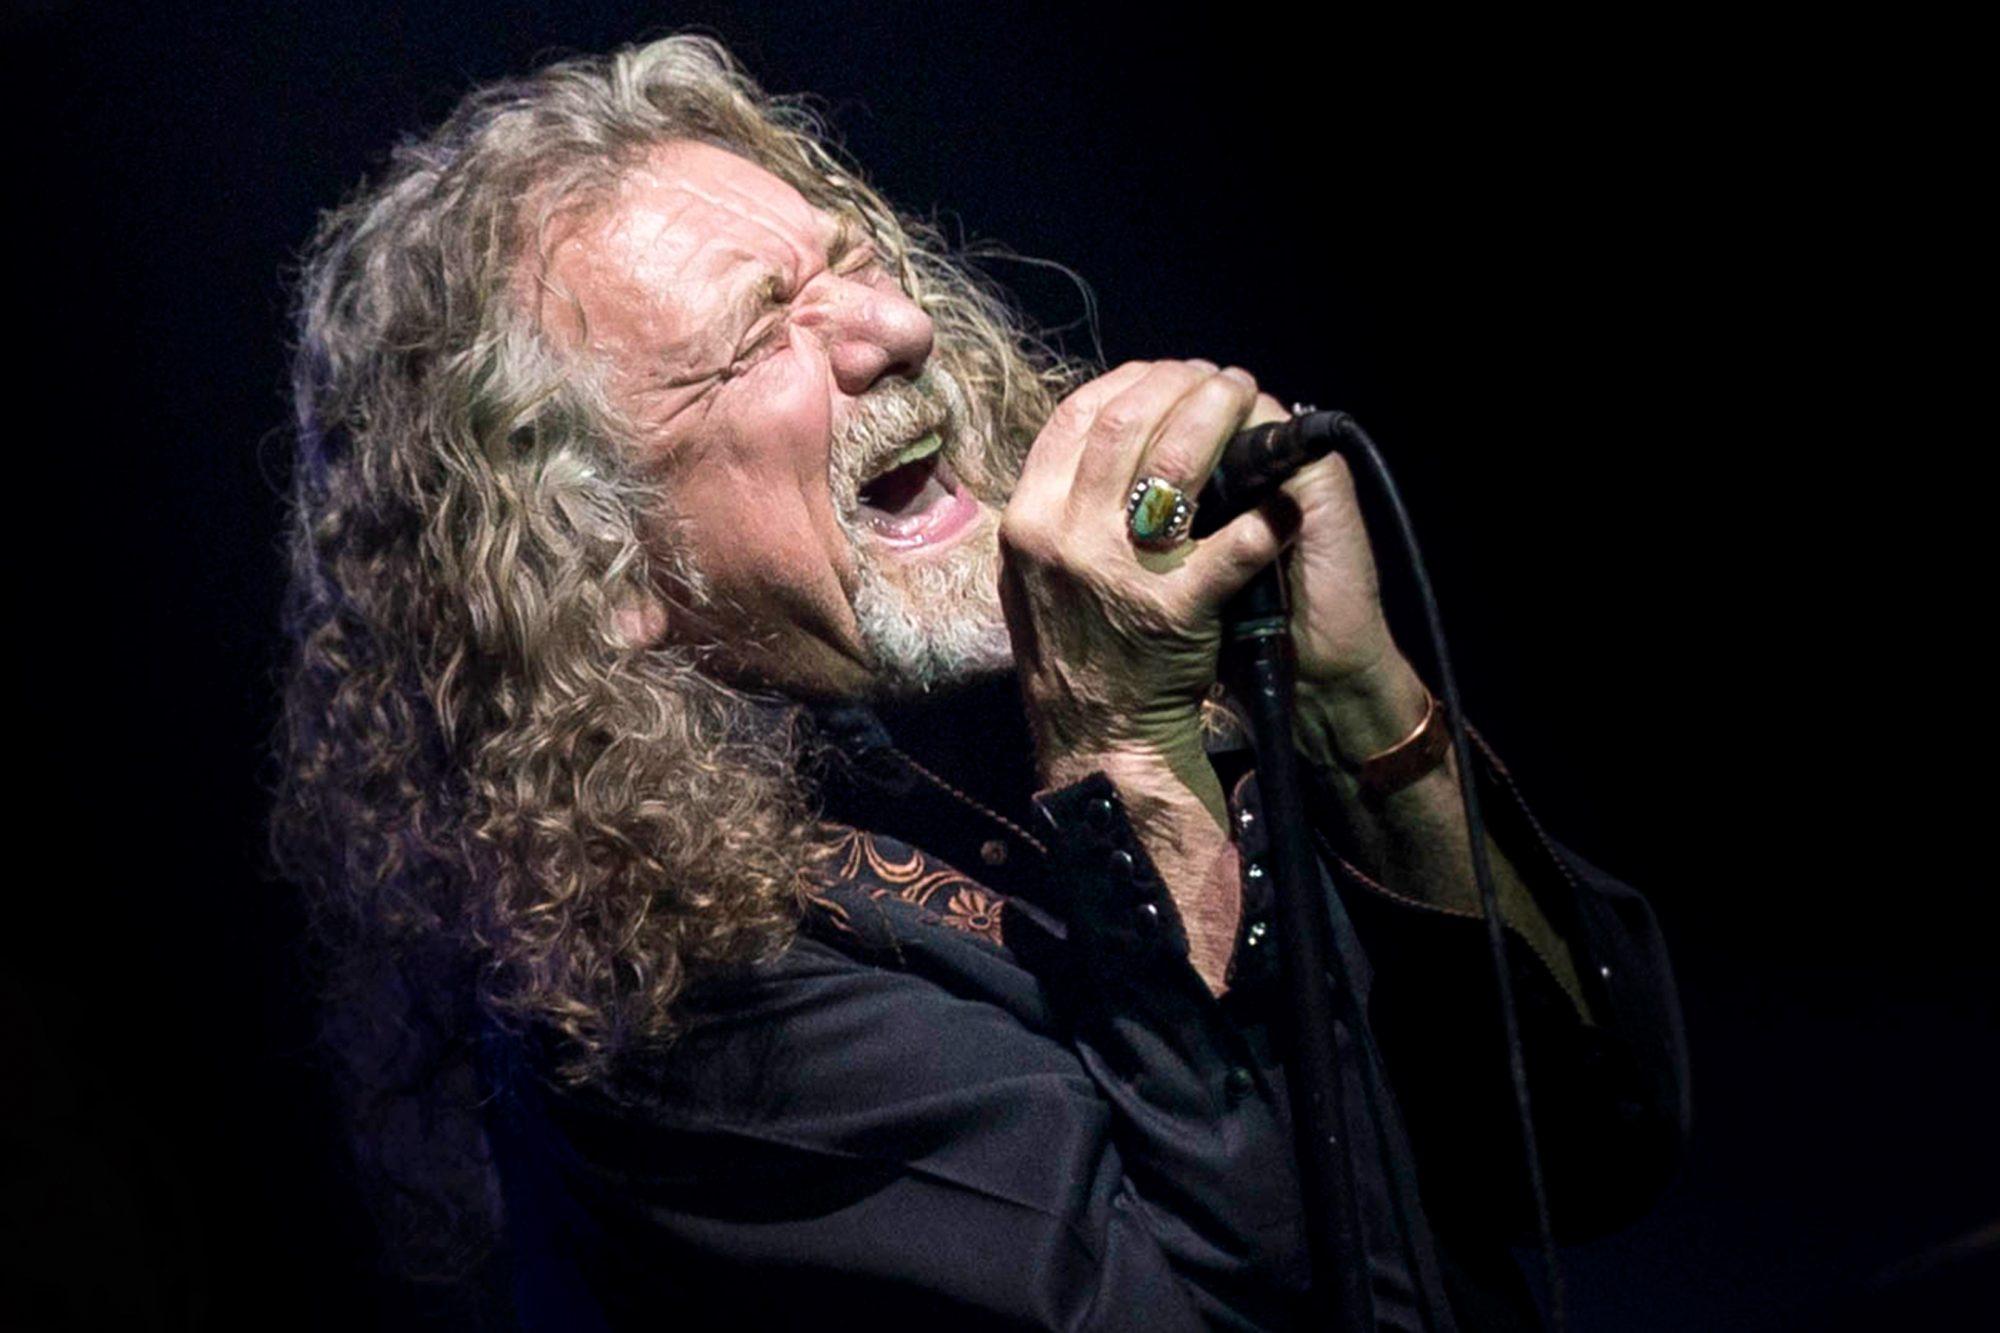 USA - Robert Plant Concert - Austin, TX